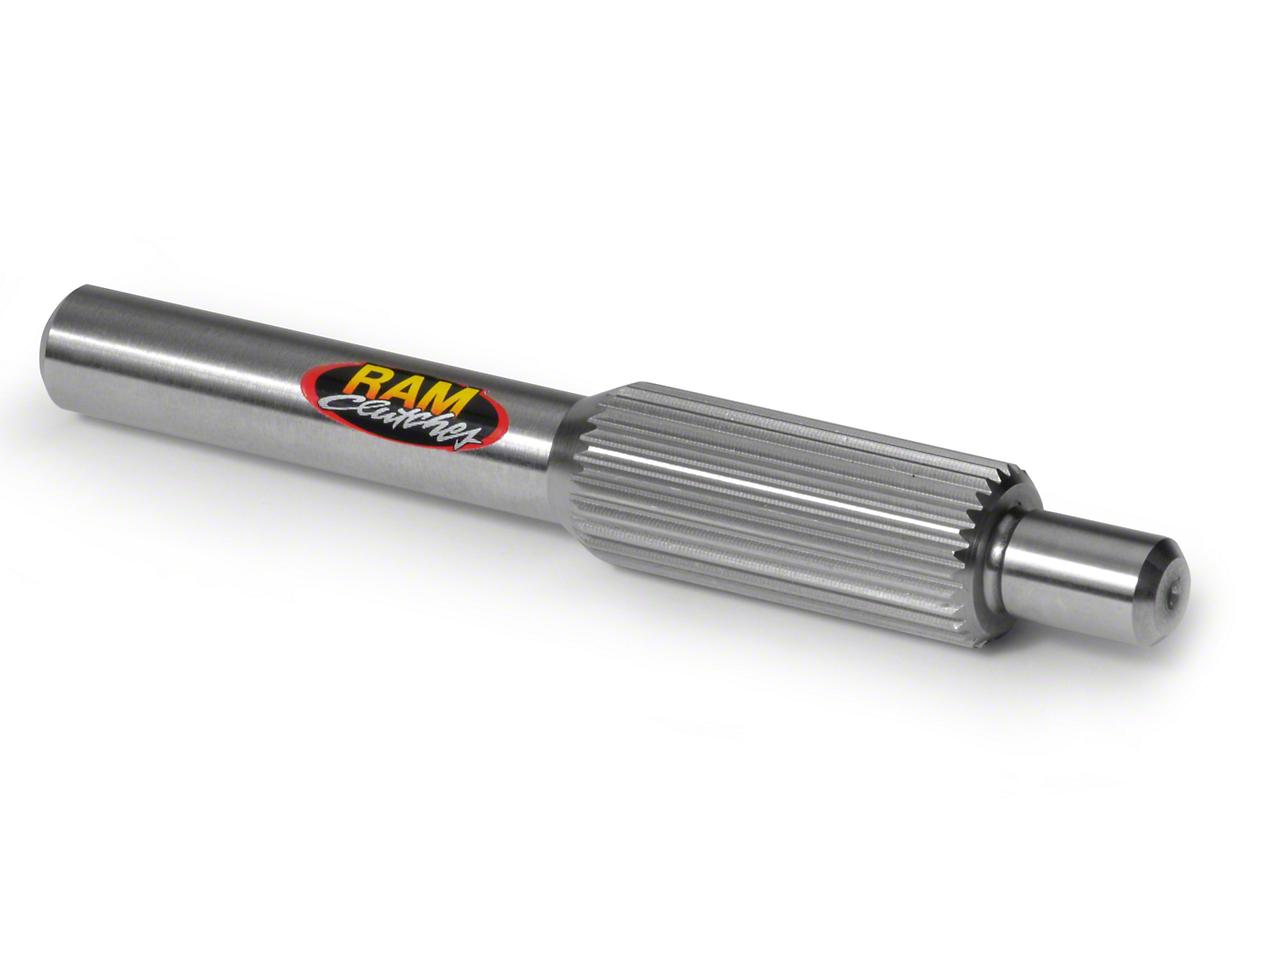 RAM Professional Clutch Alignment Tool - 26 Spline